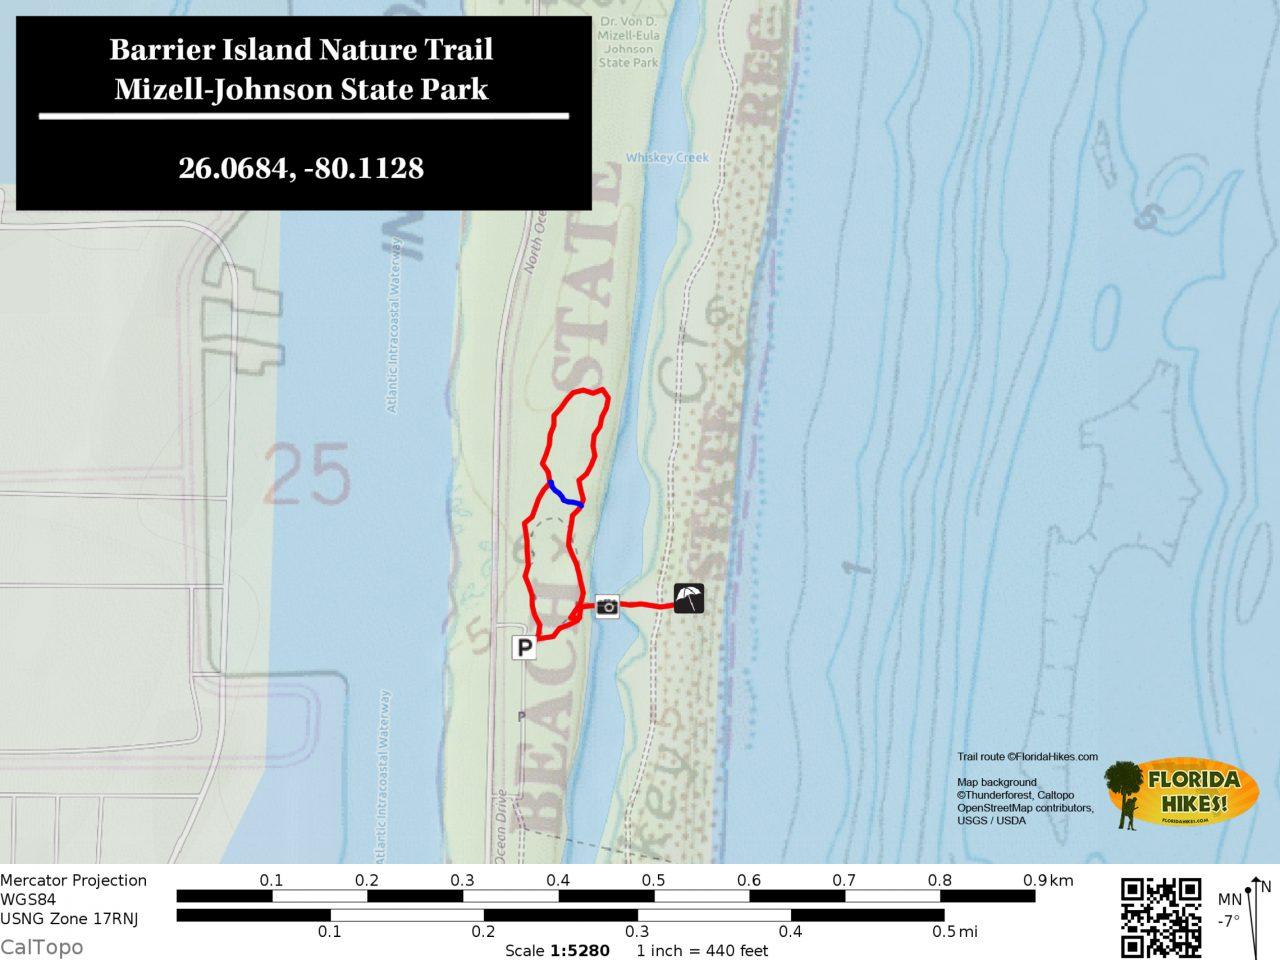 Barrier Island Trail map